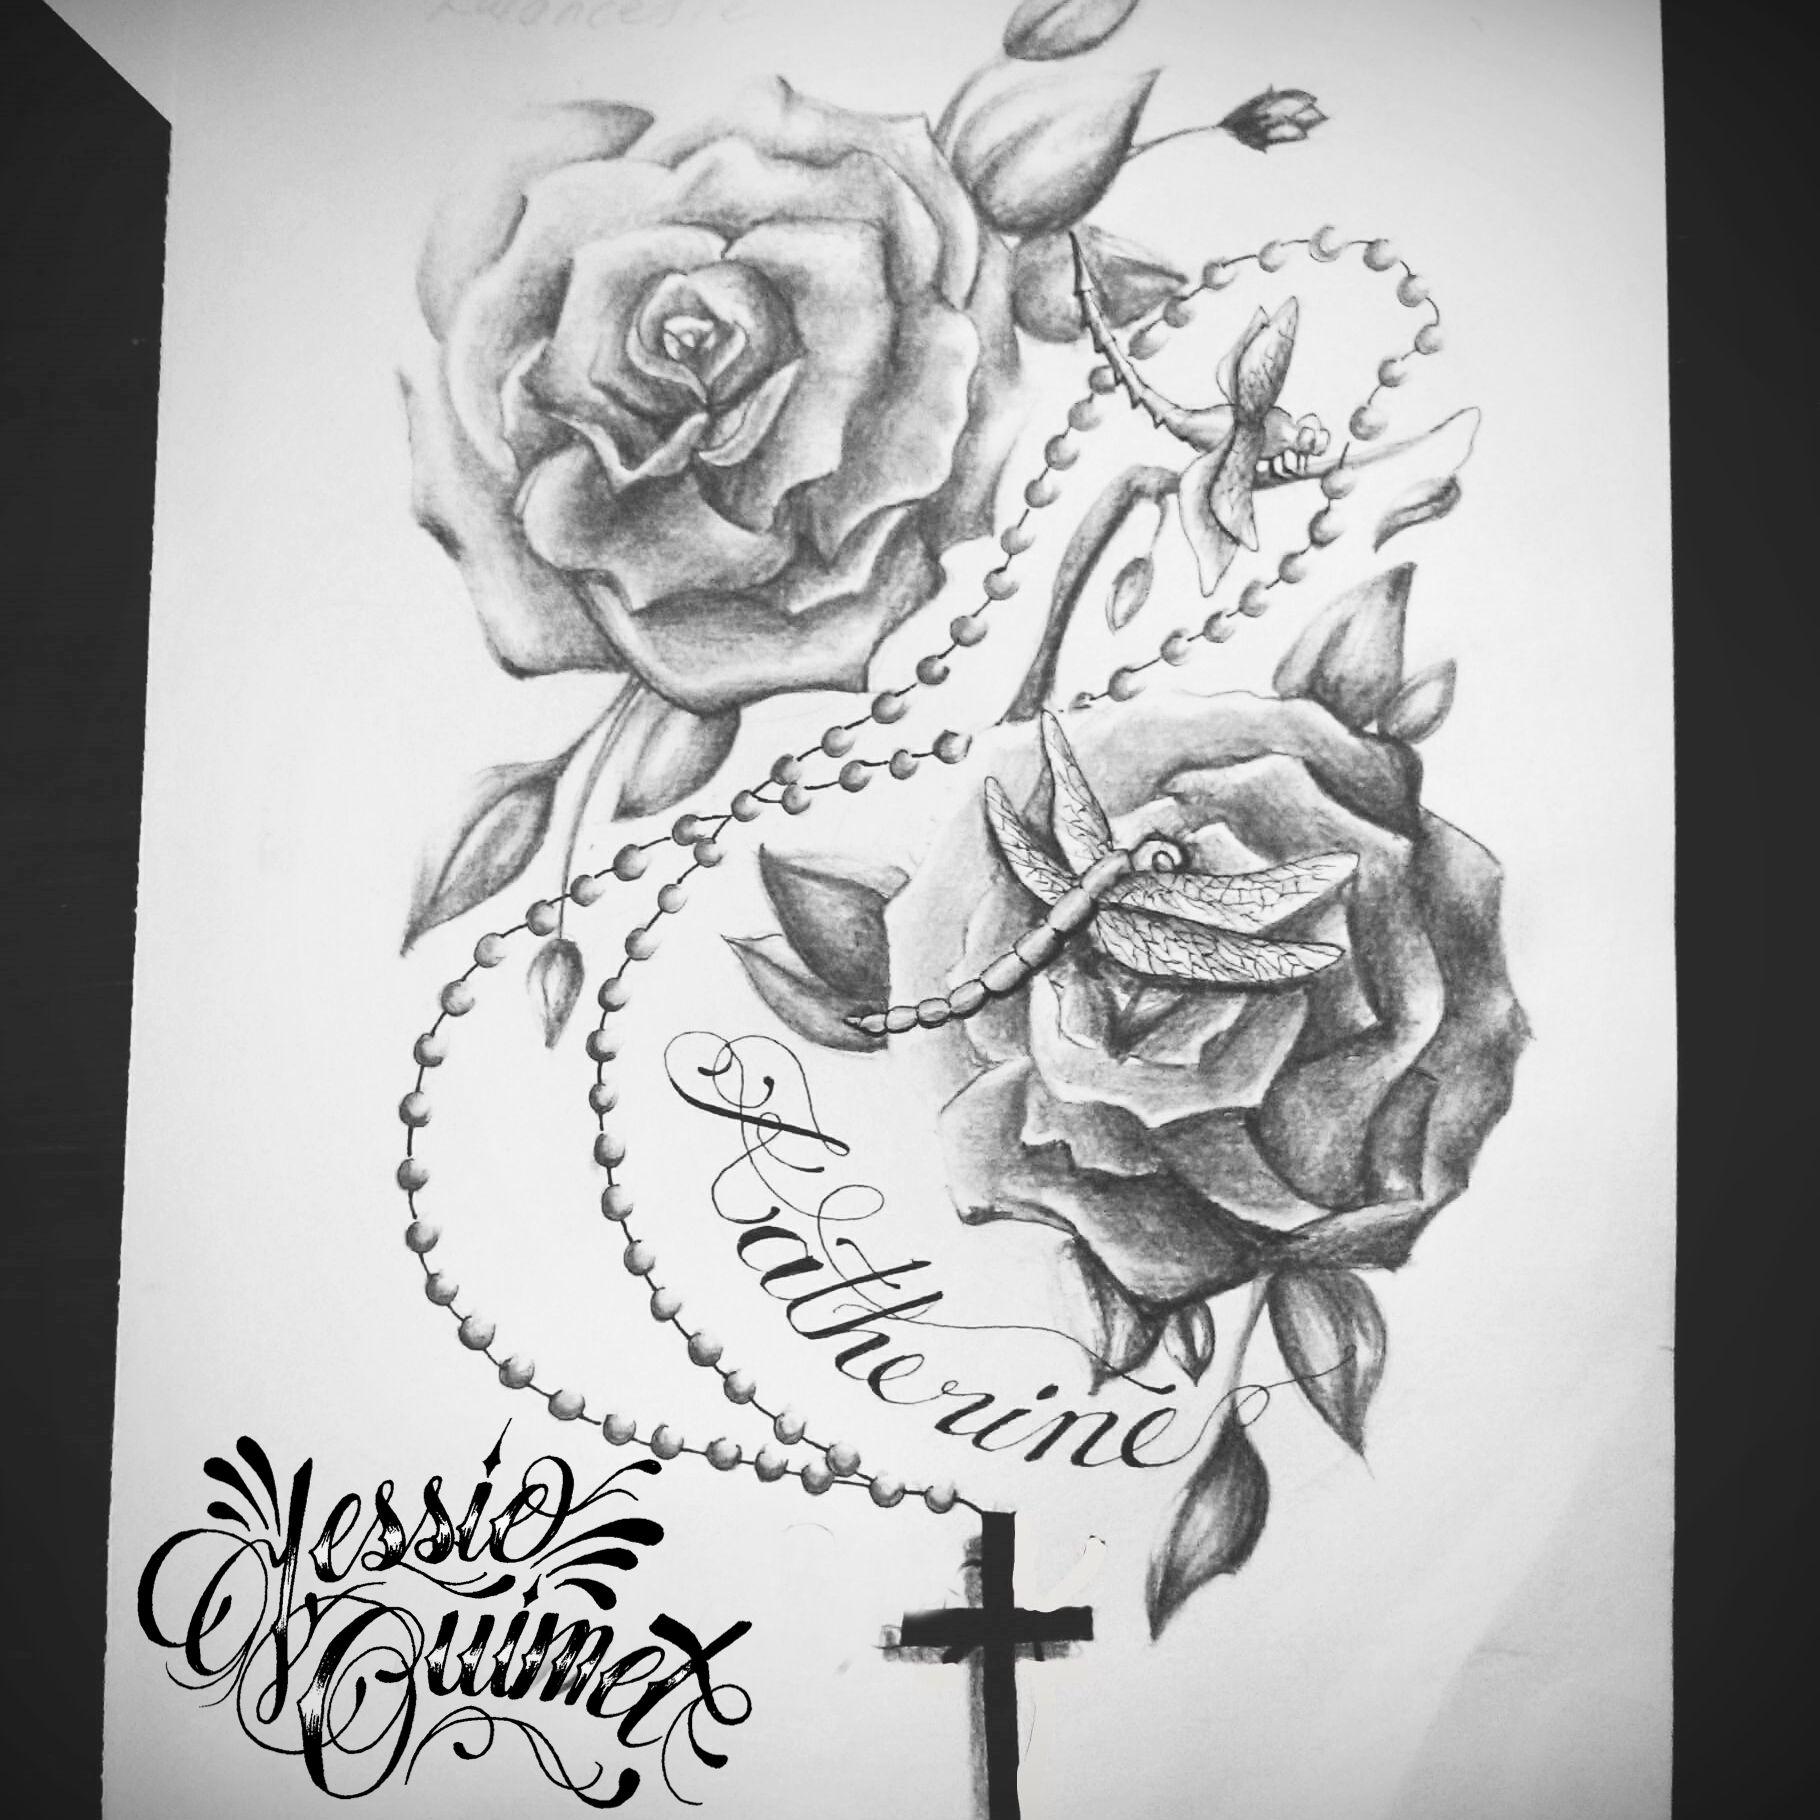 Jessie Ouimet Jessieouimet Drawing Artist Tattoo Design Custom Original Ideas Creations Awesome Tattoo Tattoo Drawings Body Art Tattoos Art Tattoo